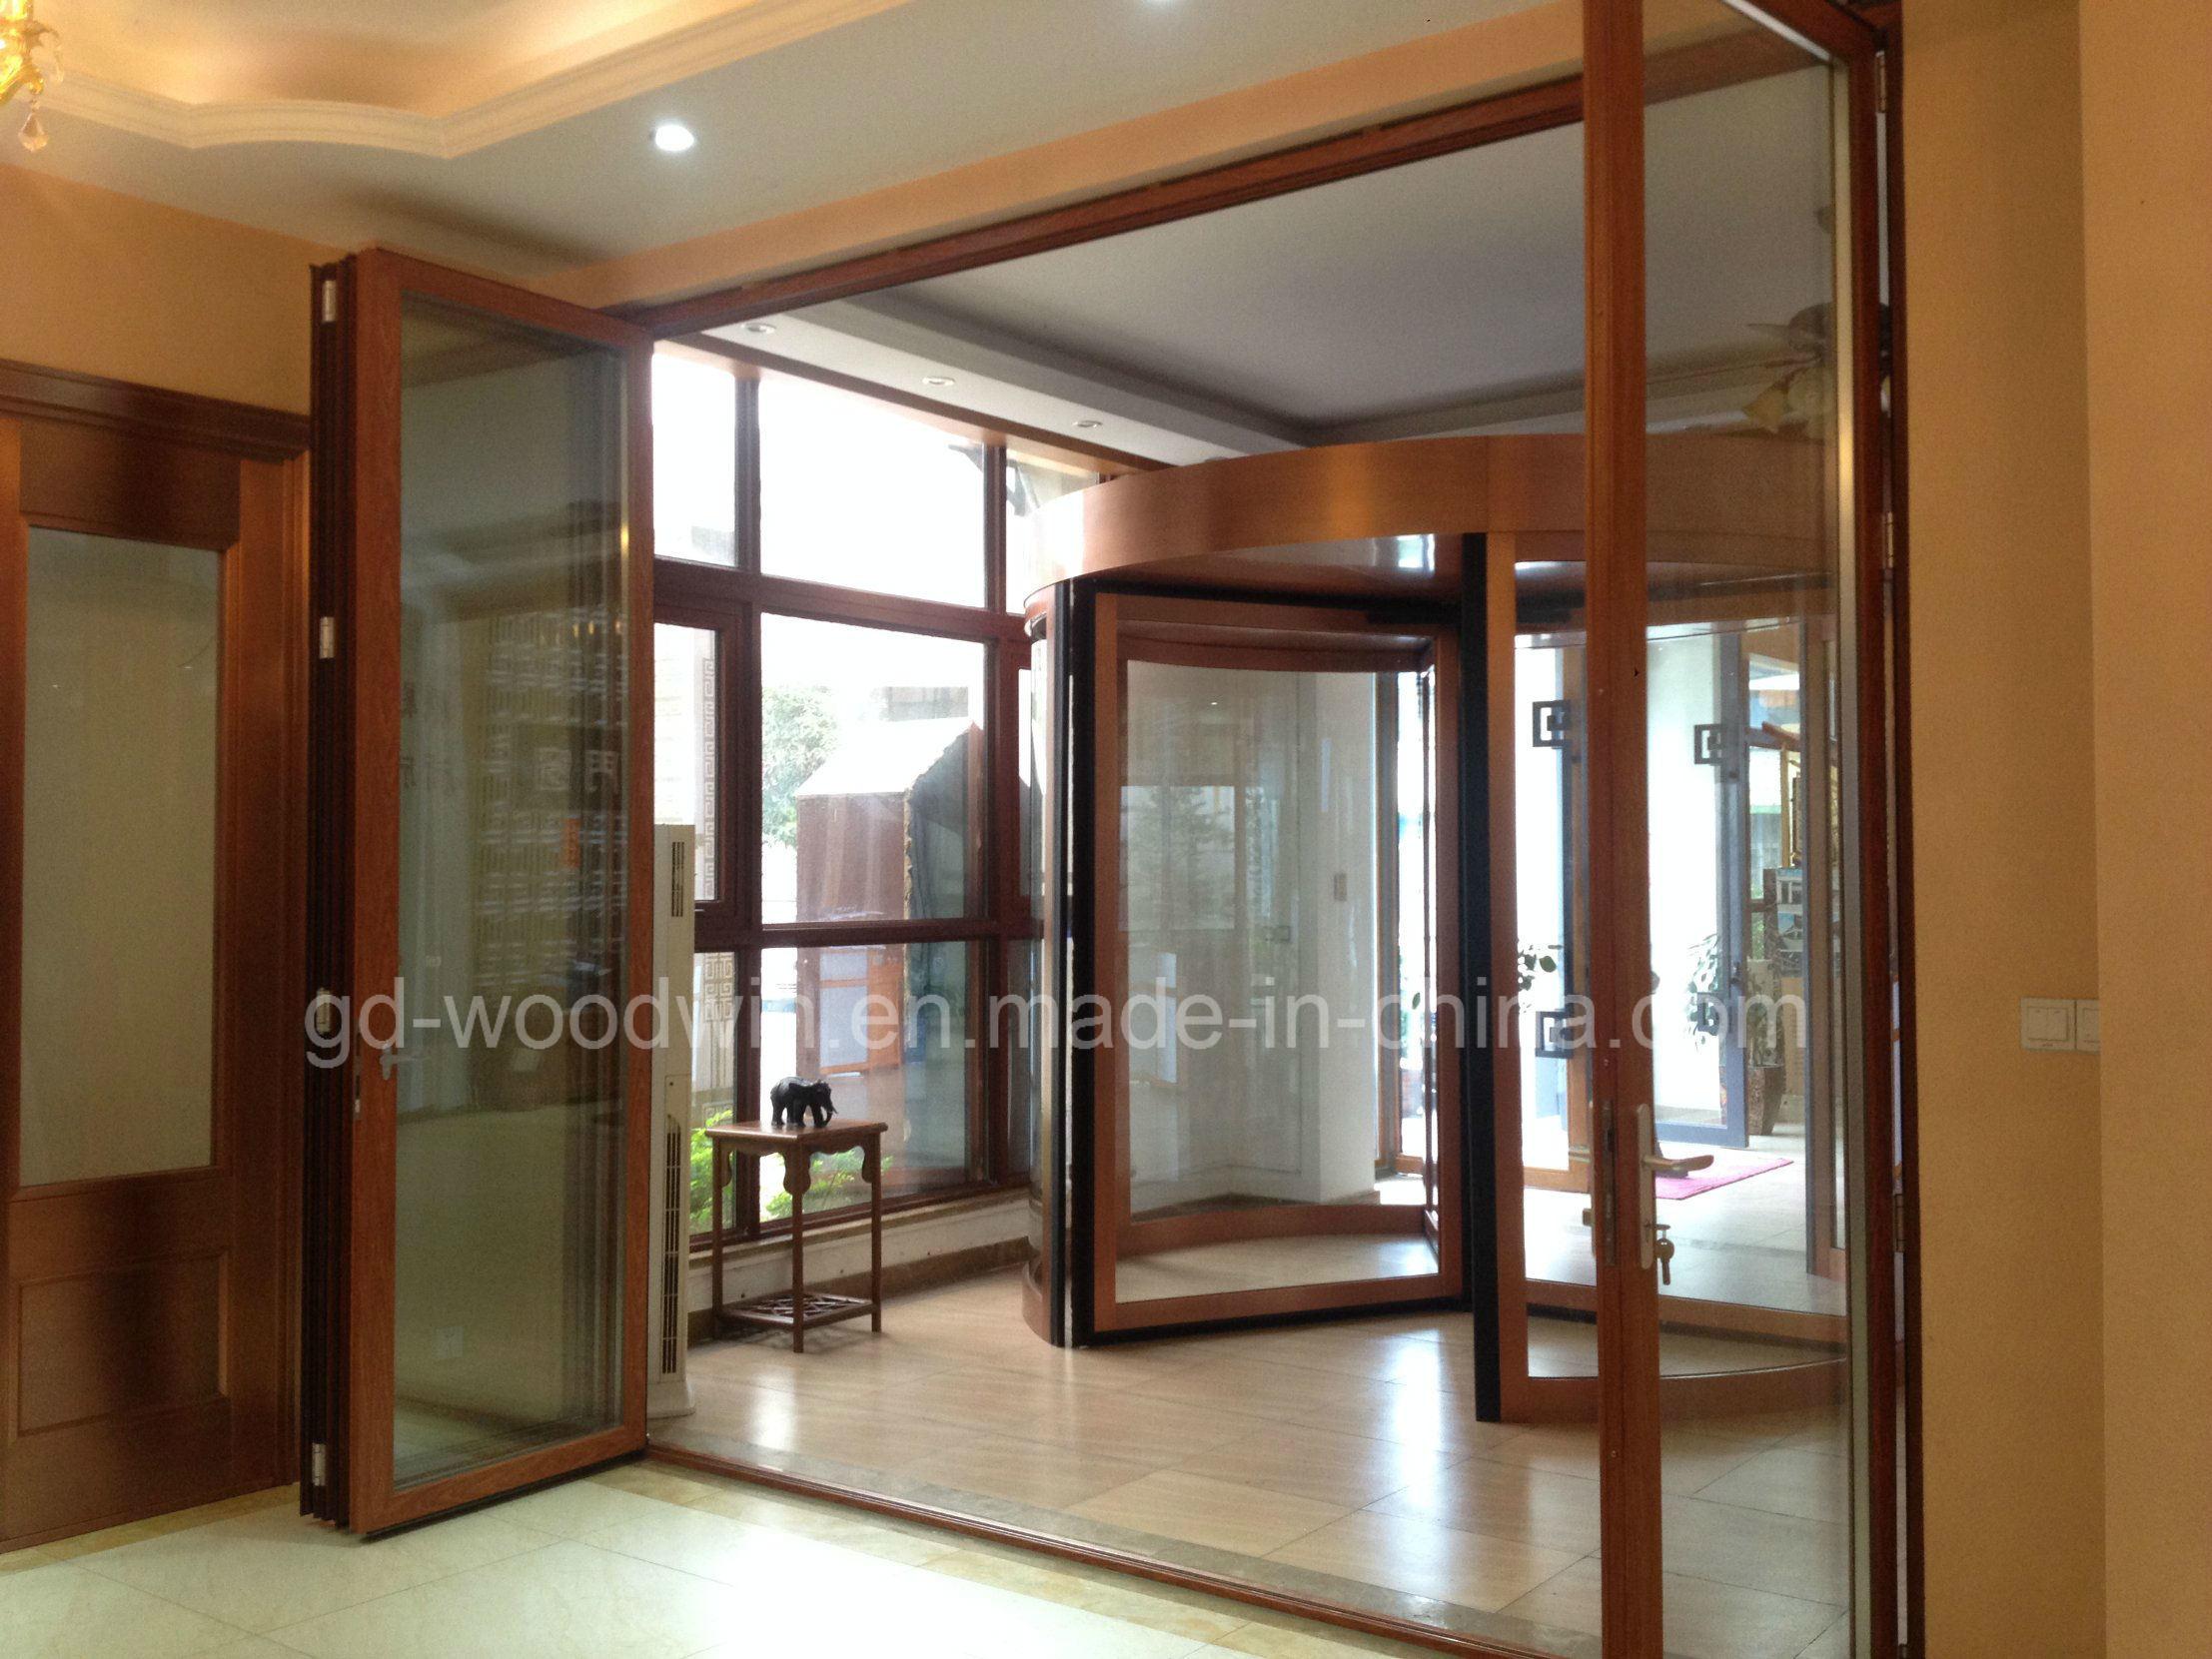 China Customized Made Double Glazed Lowe Glass Balcony Folding Door ...